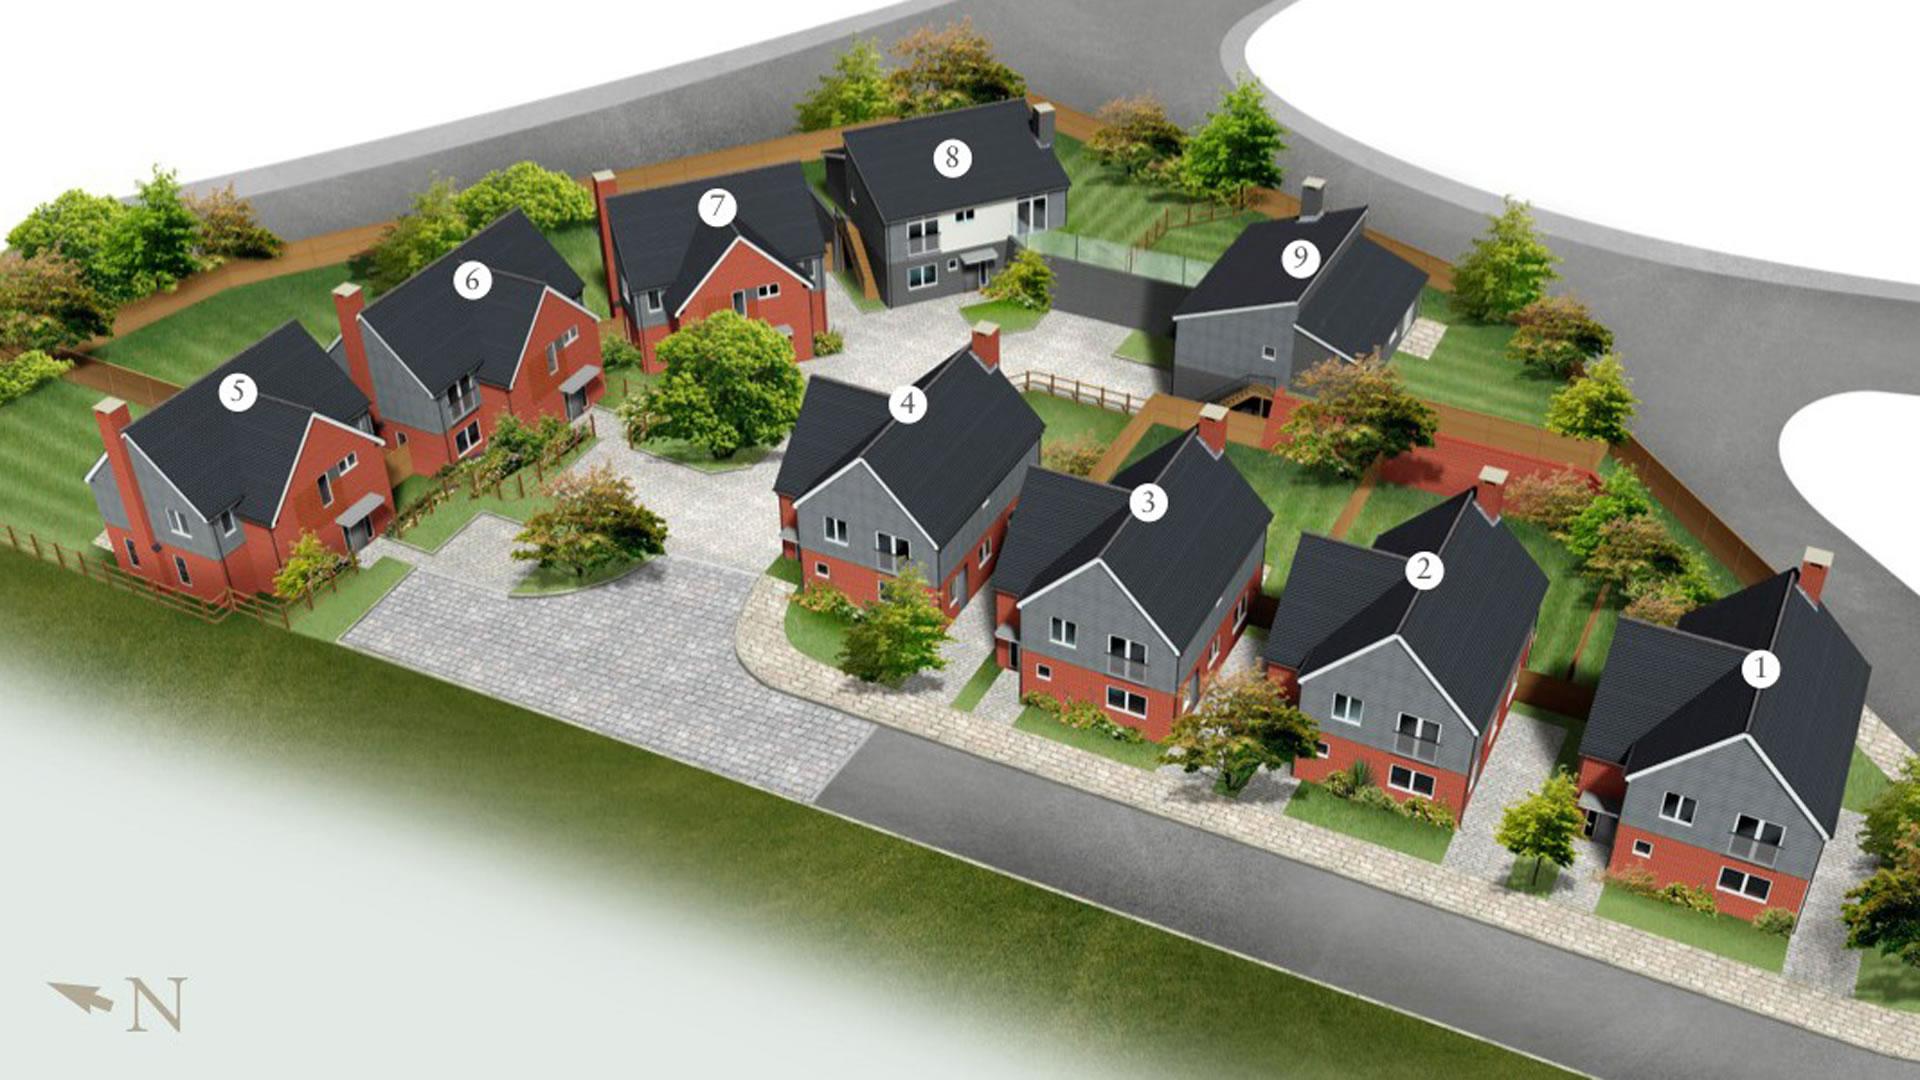 Castor Park development illustration